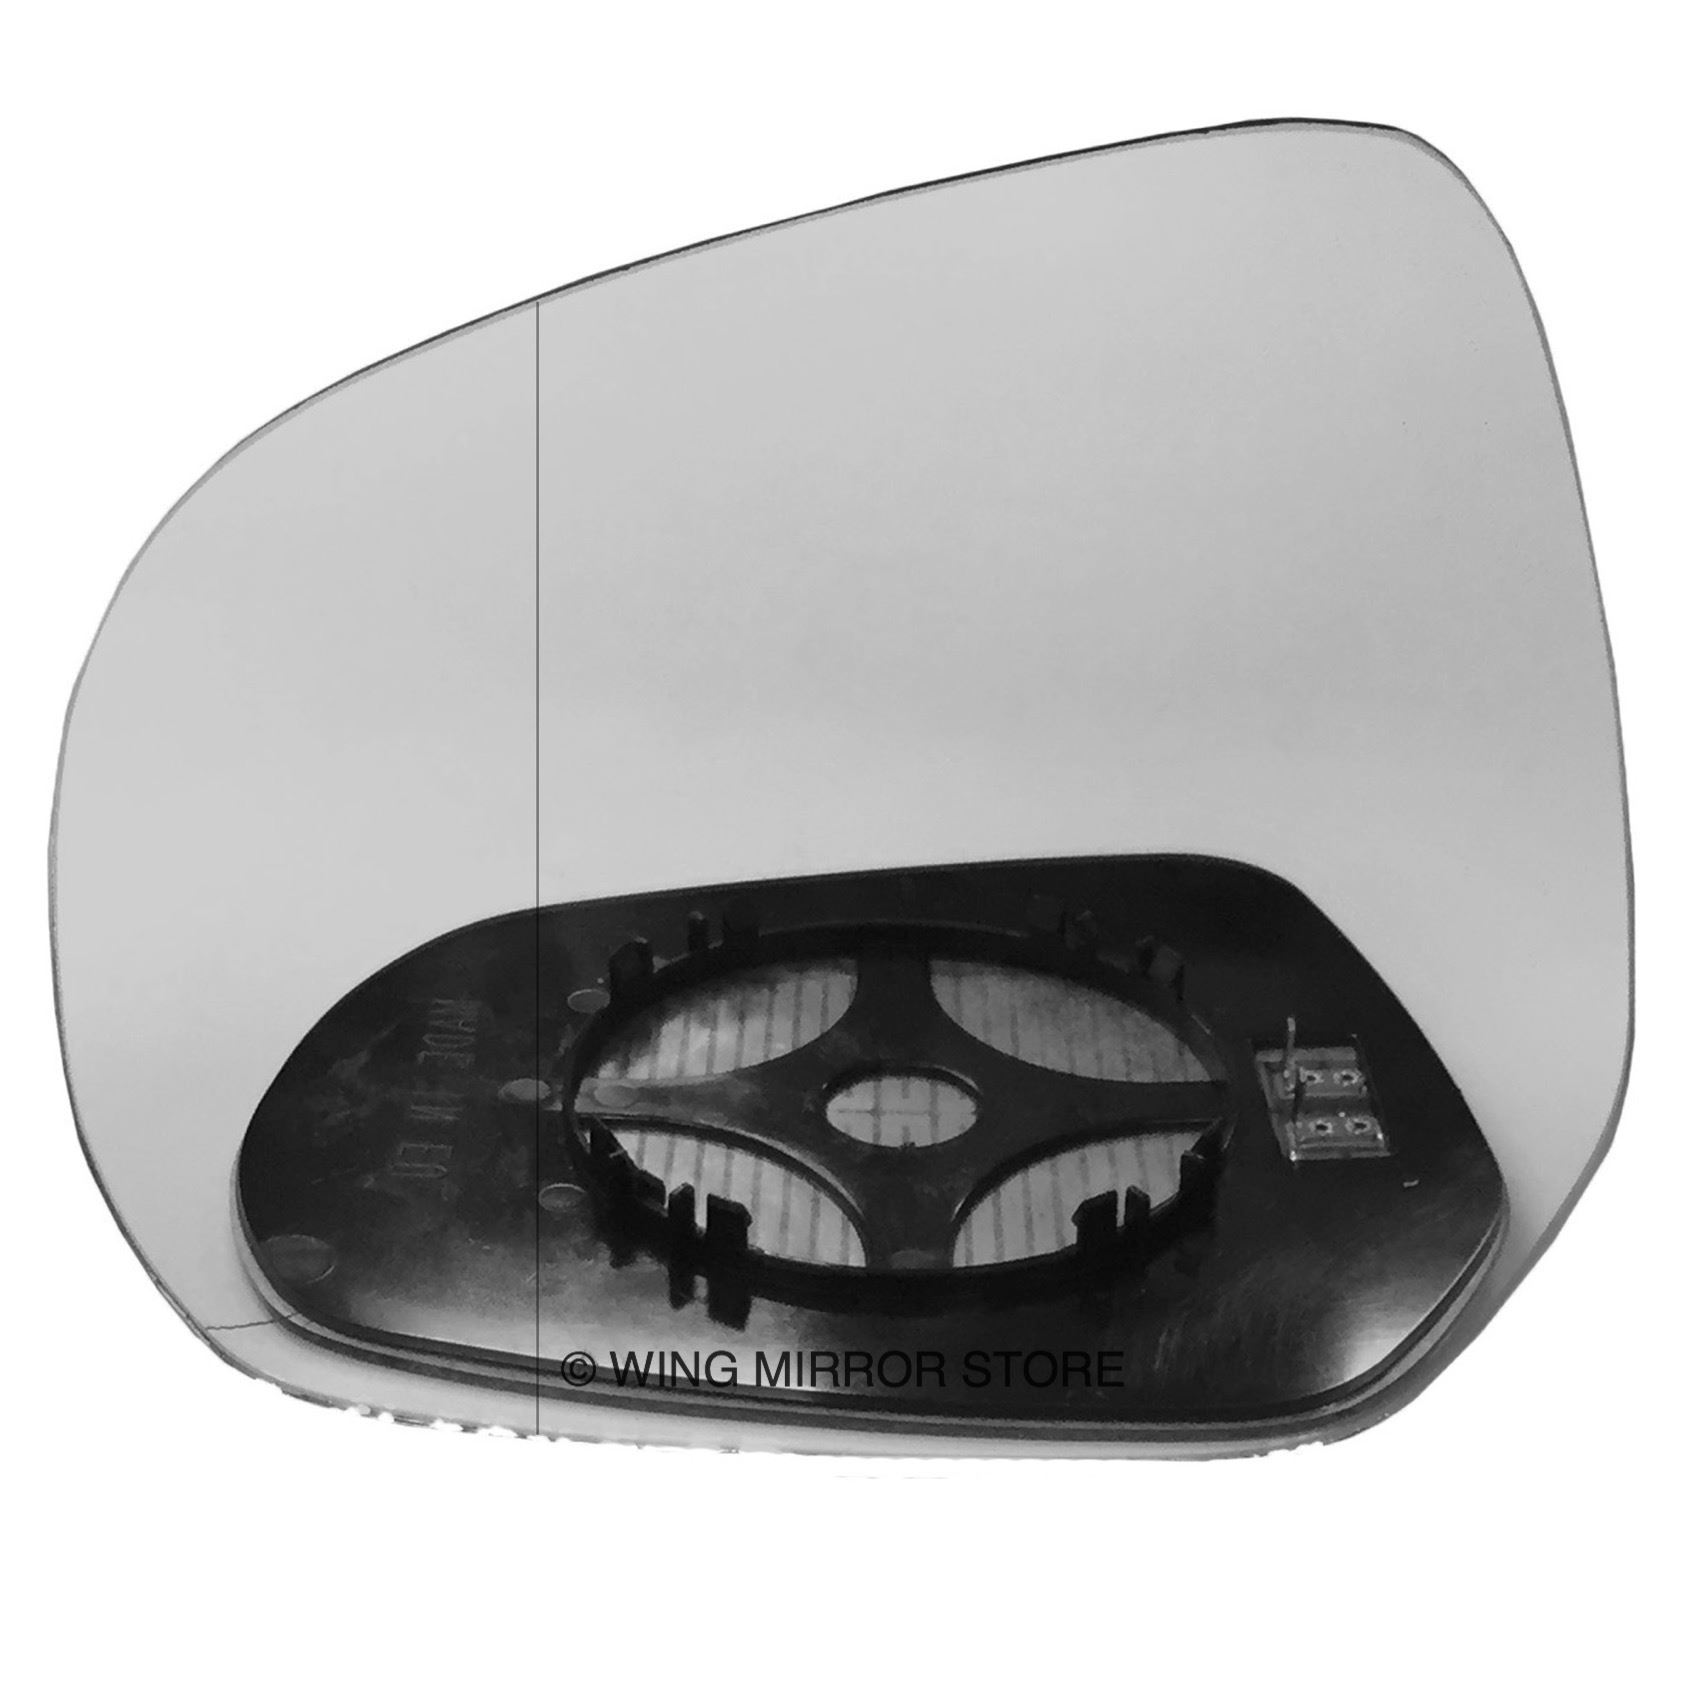 For Suzuki Splash 08-14 Left passenger Flat Electric wing mirror glass w// plate